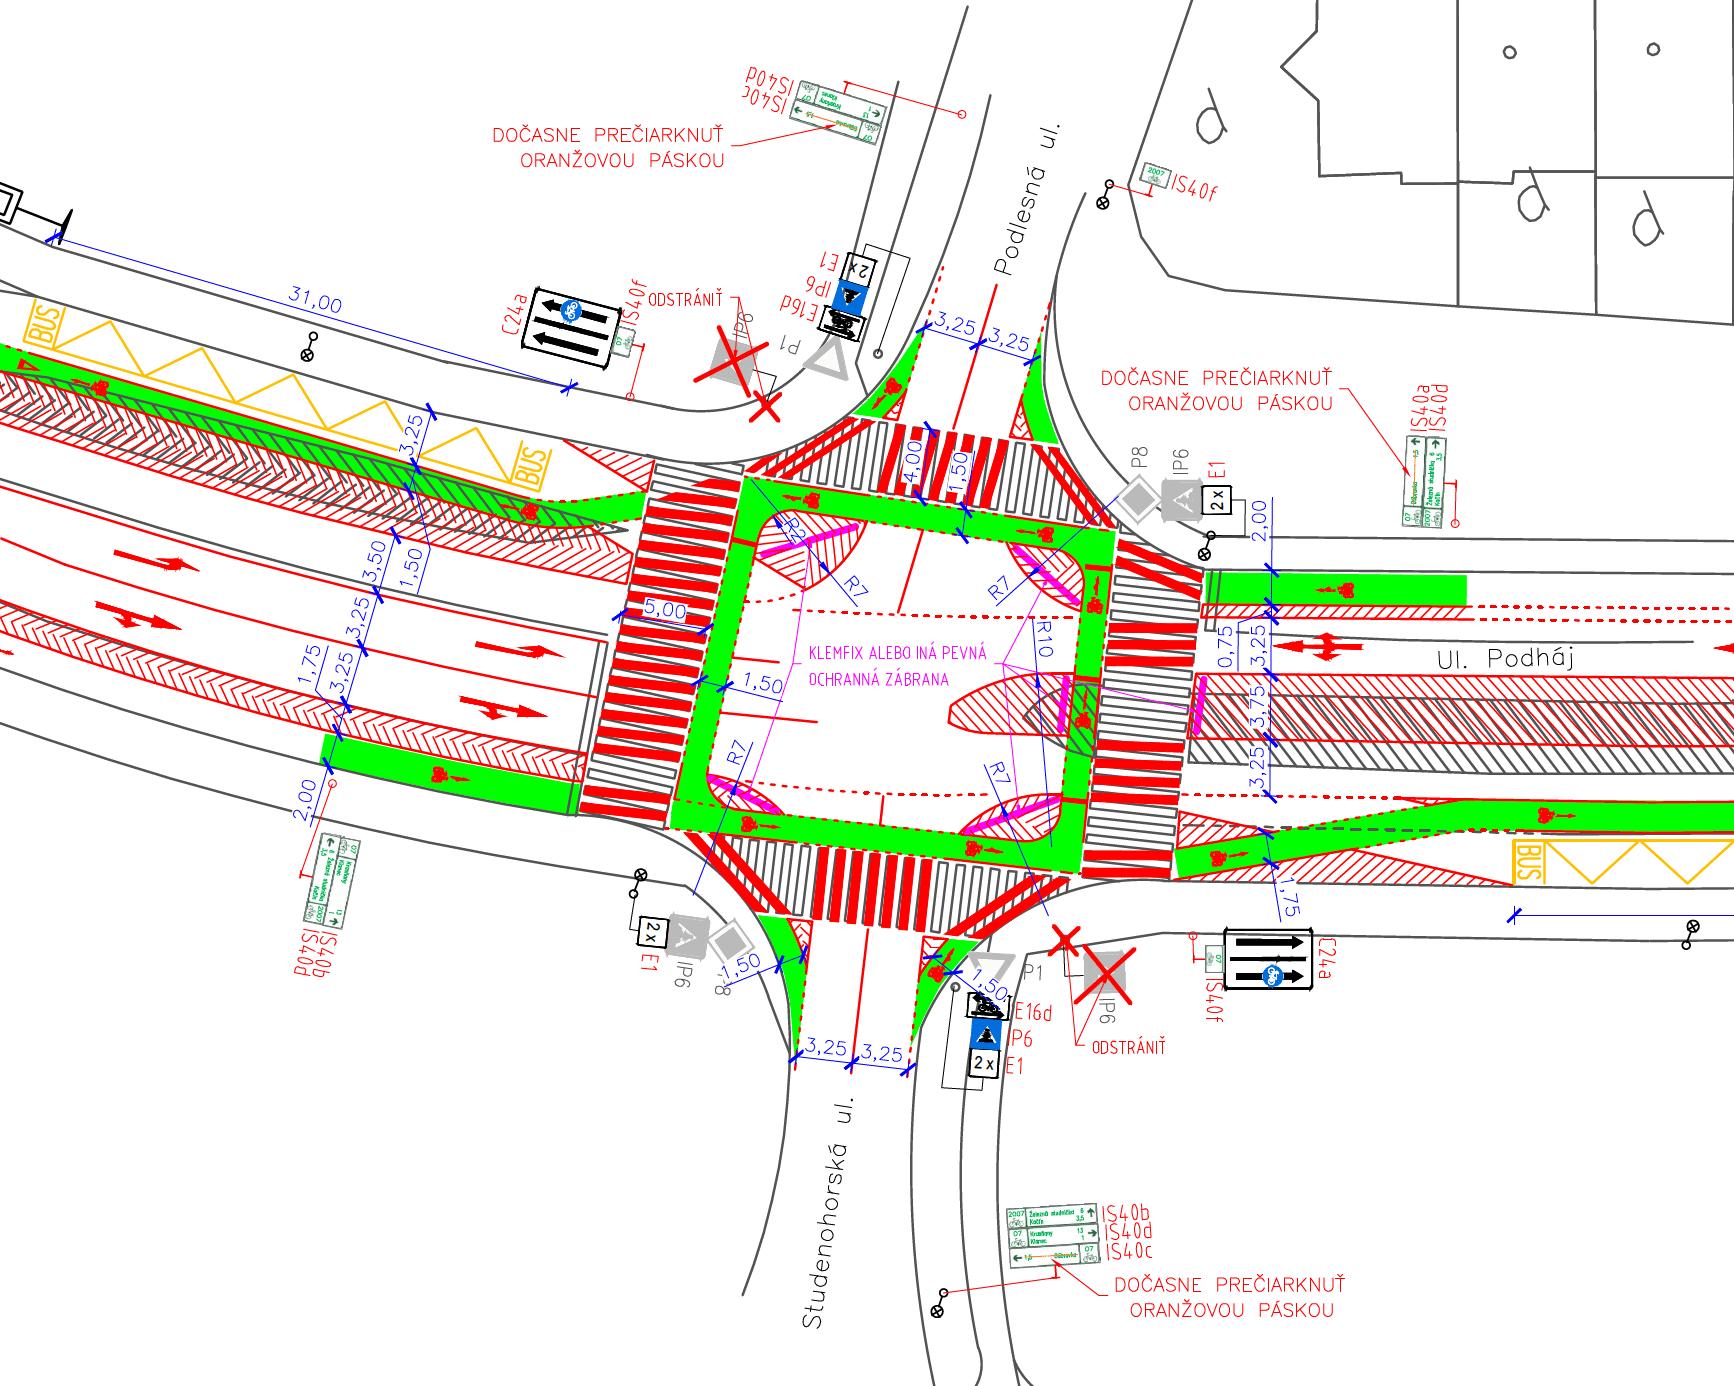 Návrh cyklotrasy na ulici Podháj